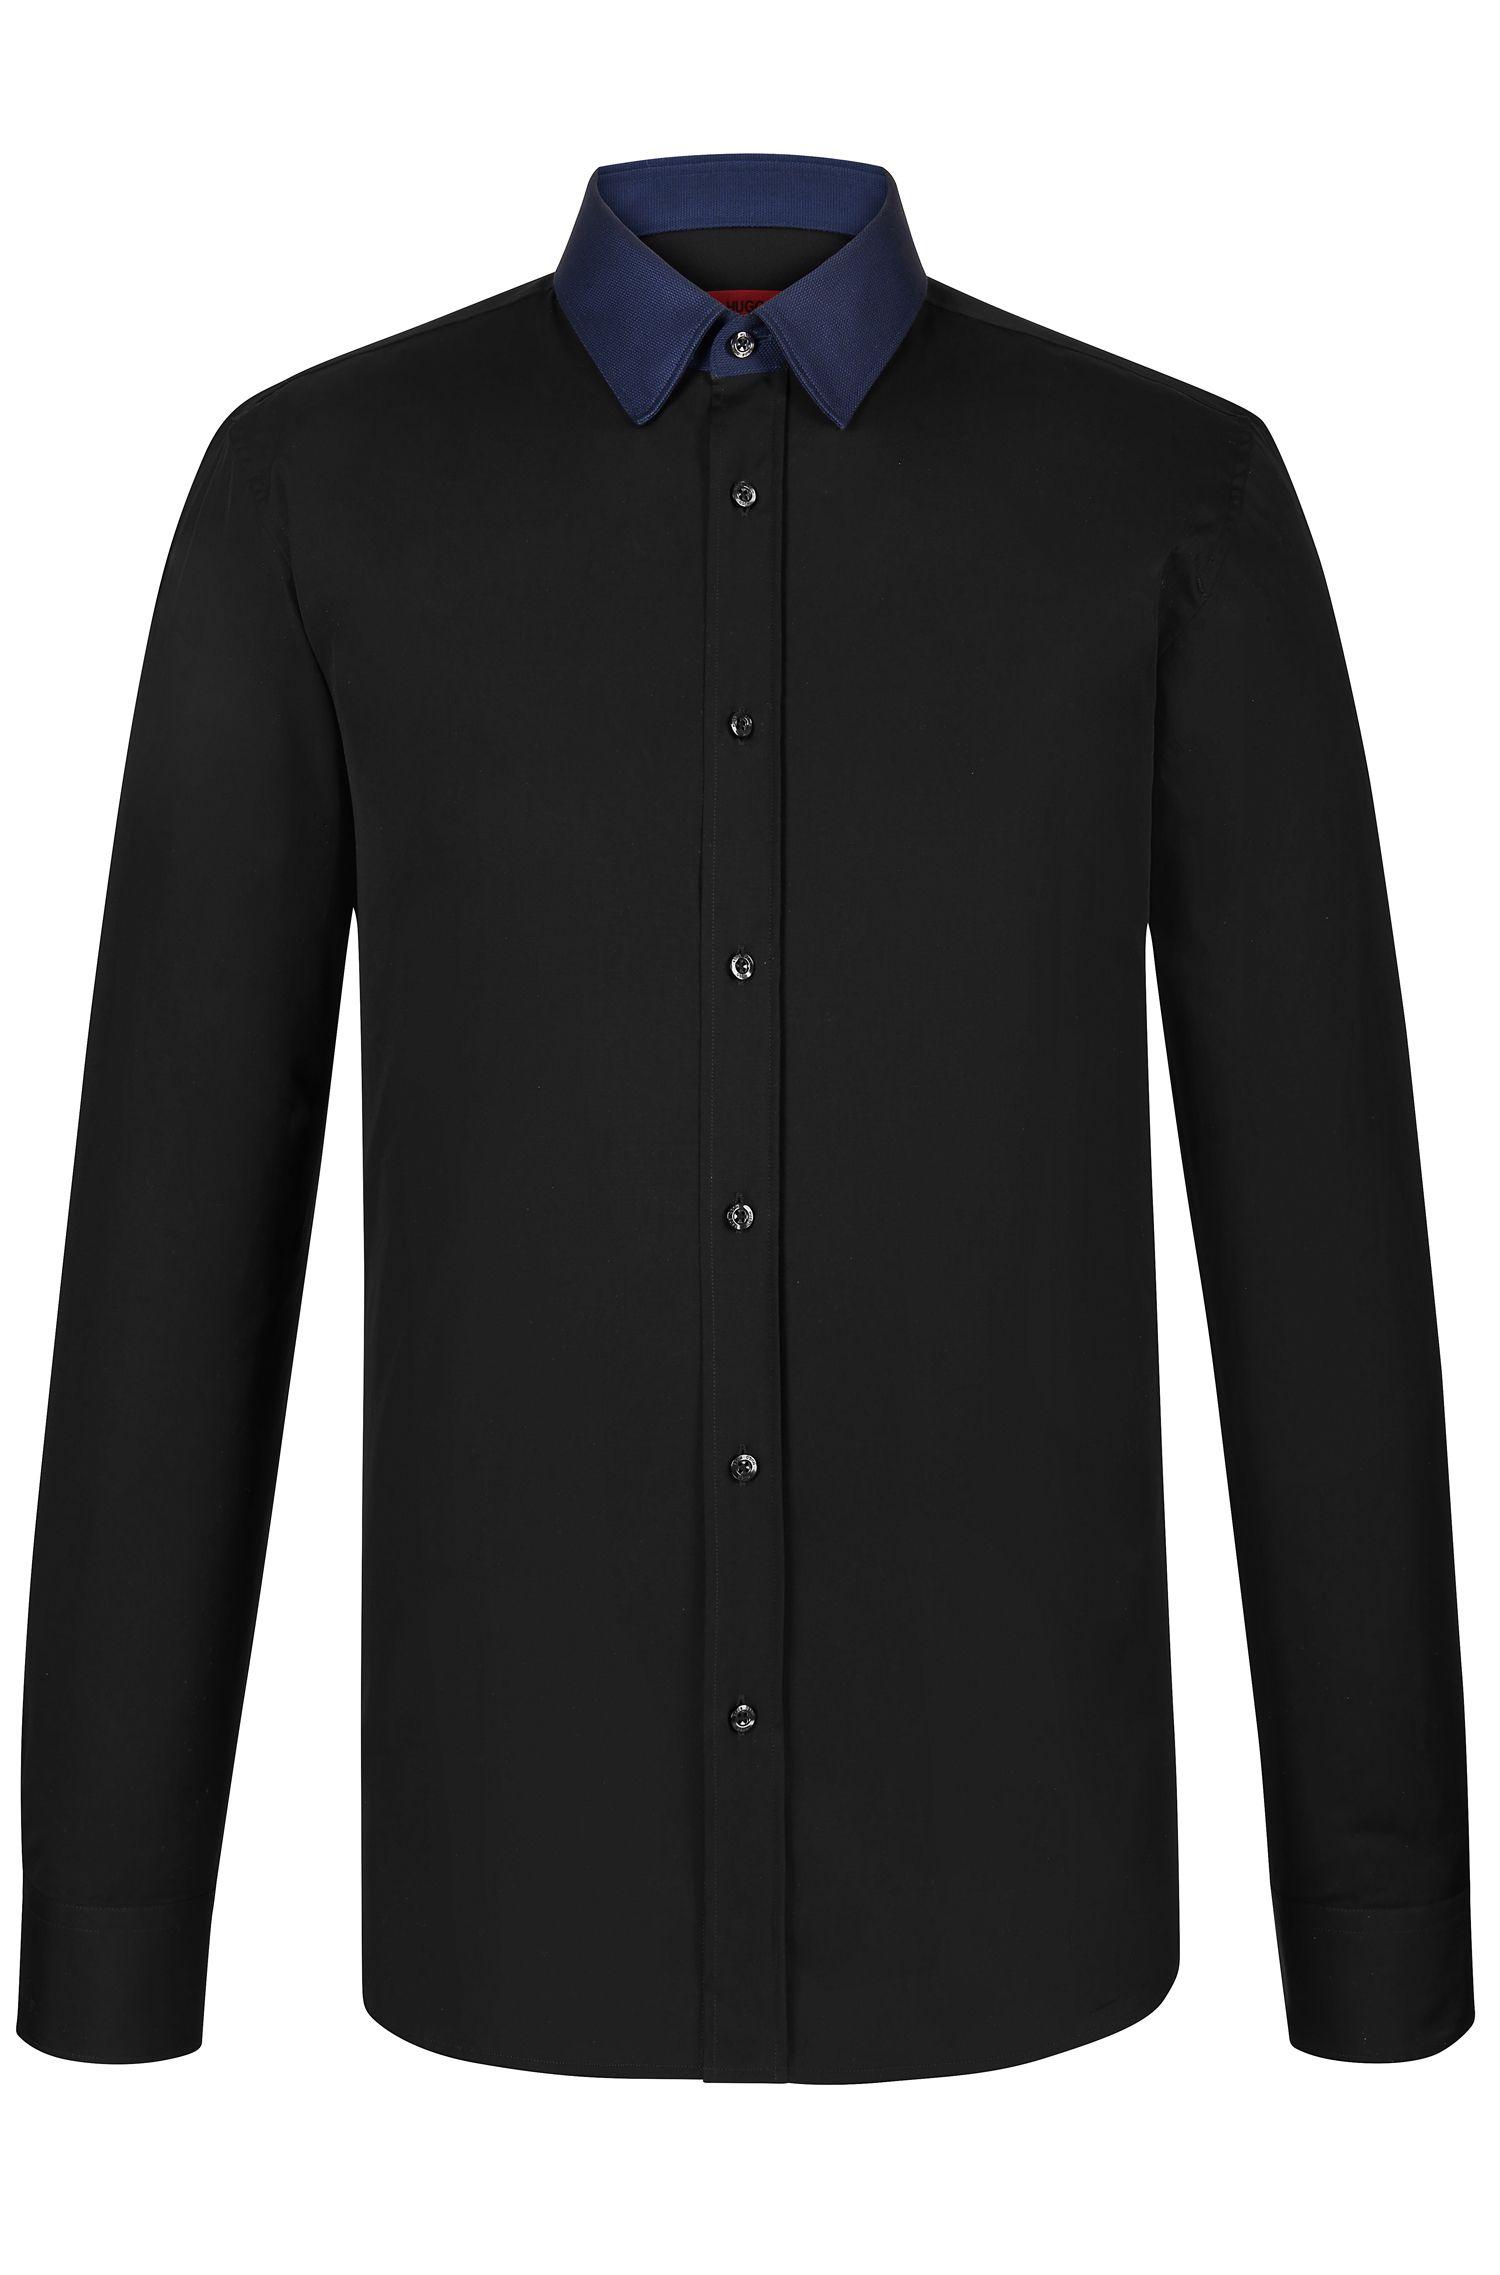 'Elisha' | Extra Slim Fit, Cotton Dress Shirt